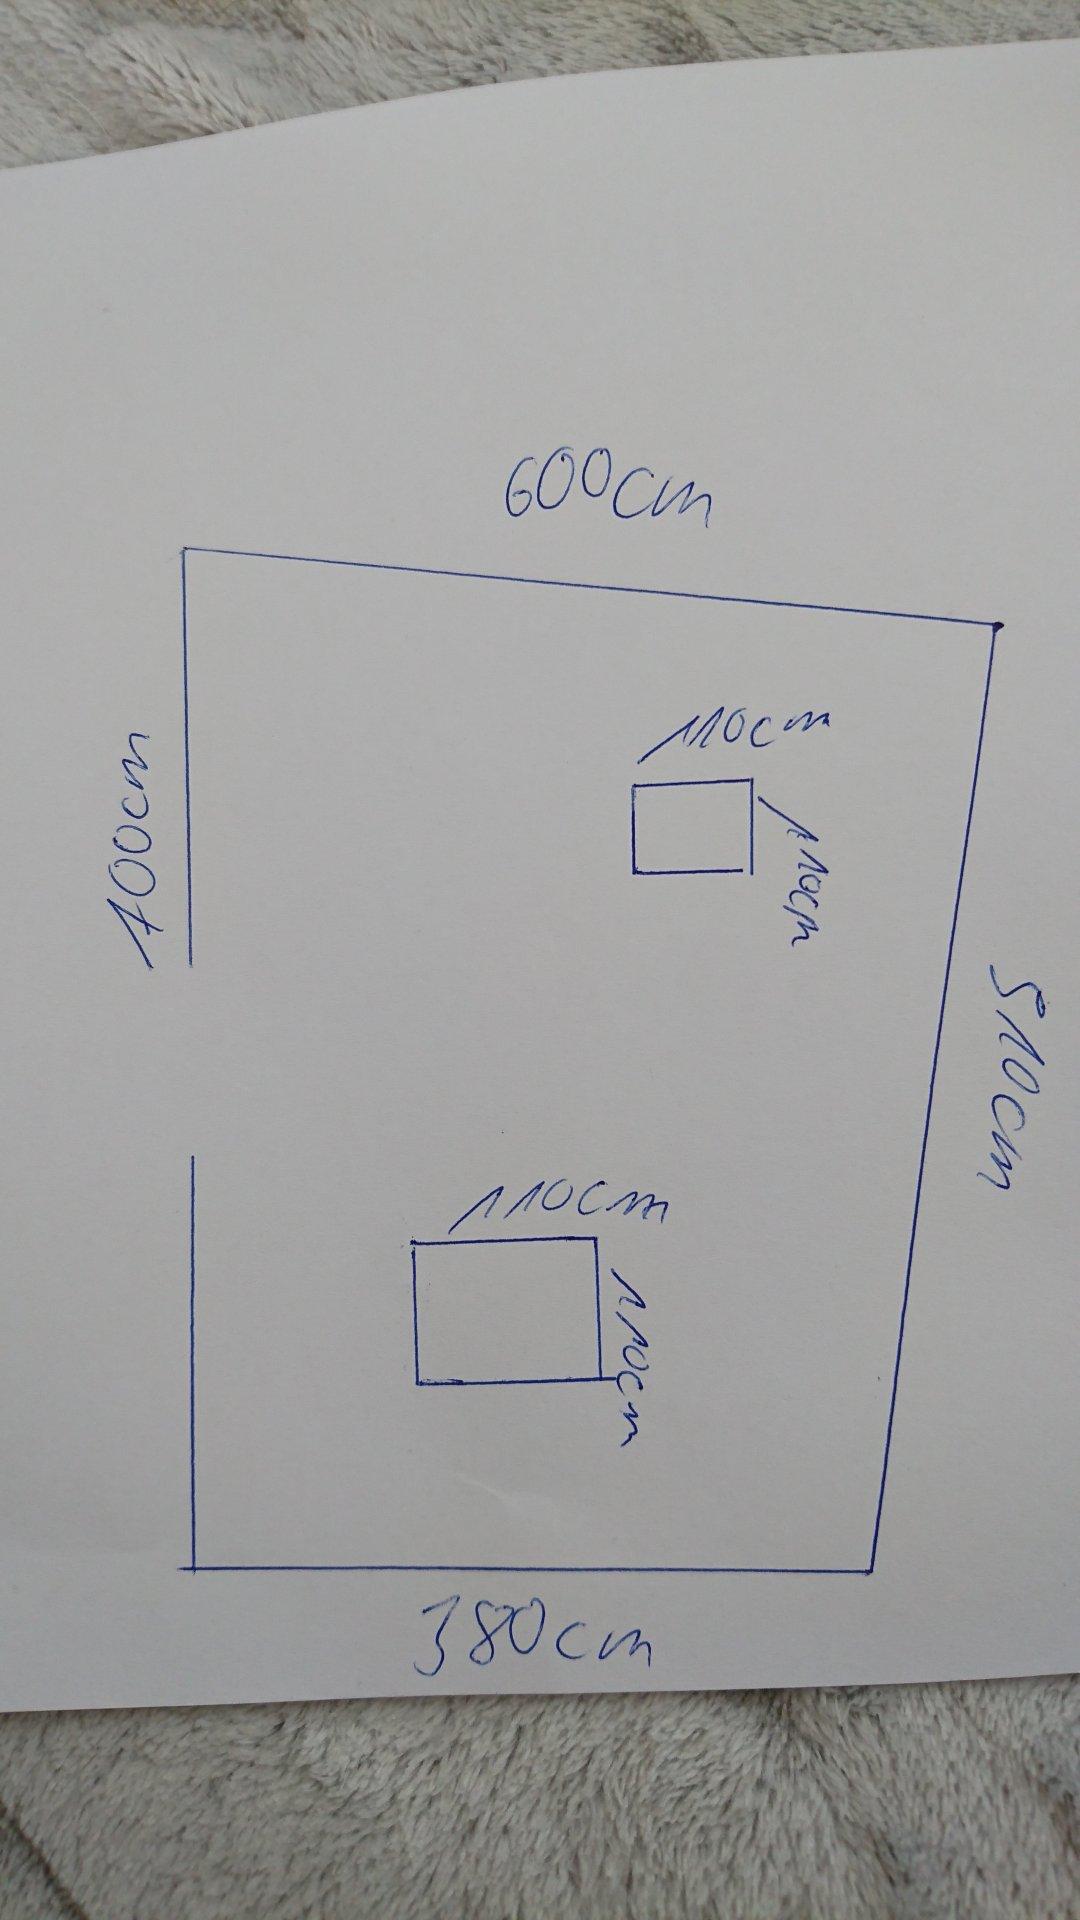 terrasse material berechnen. Black Bedroom Furniture Sets. Home Design Ideas